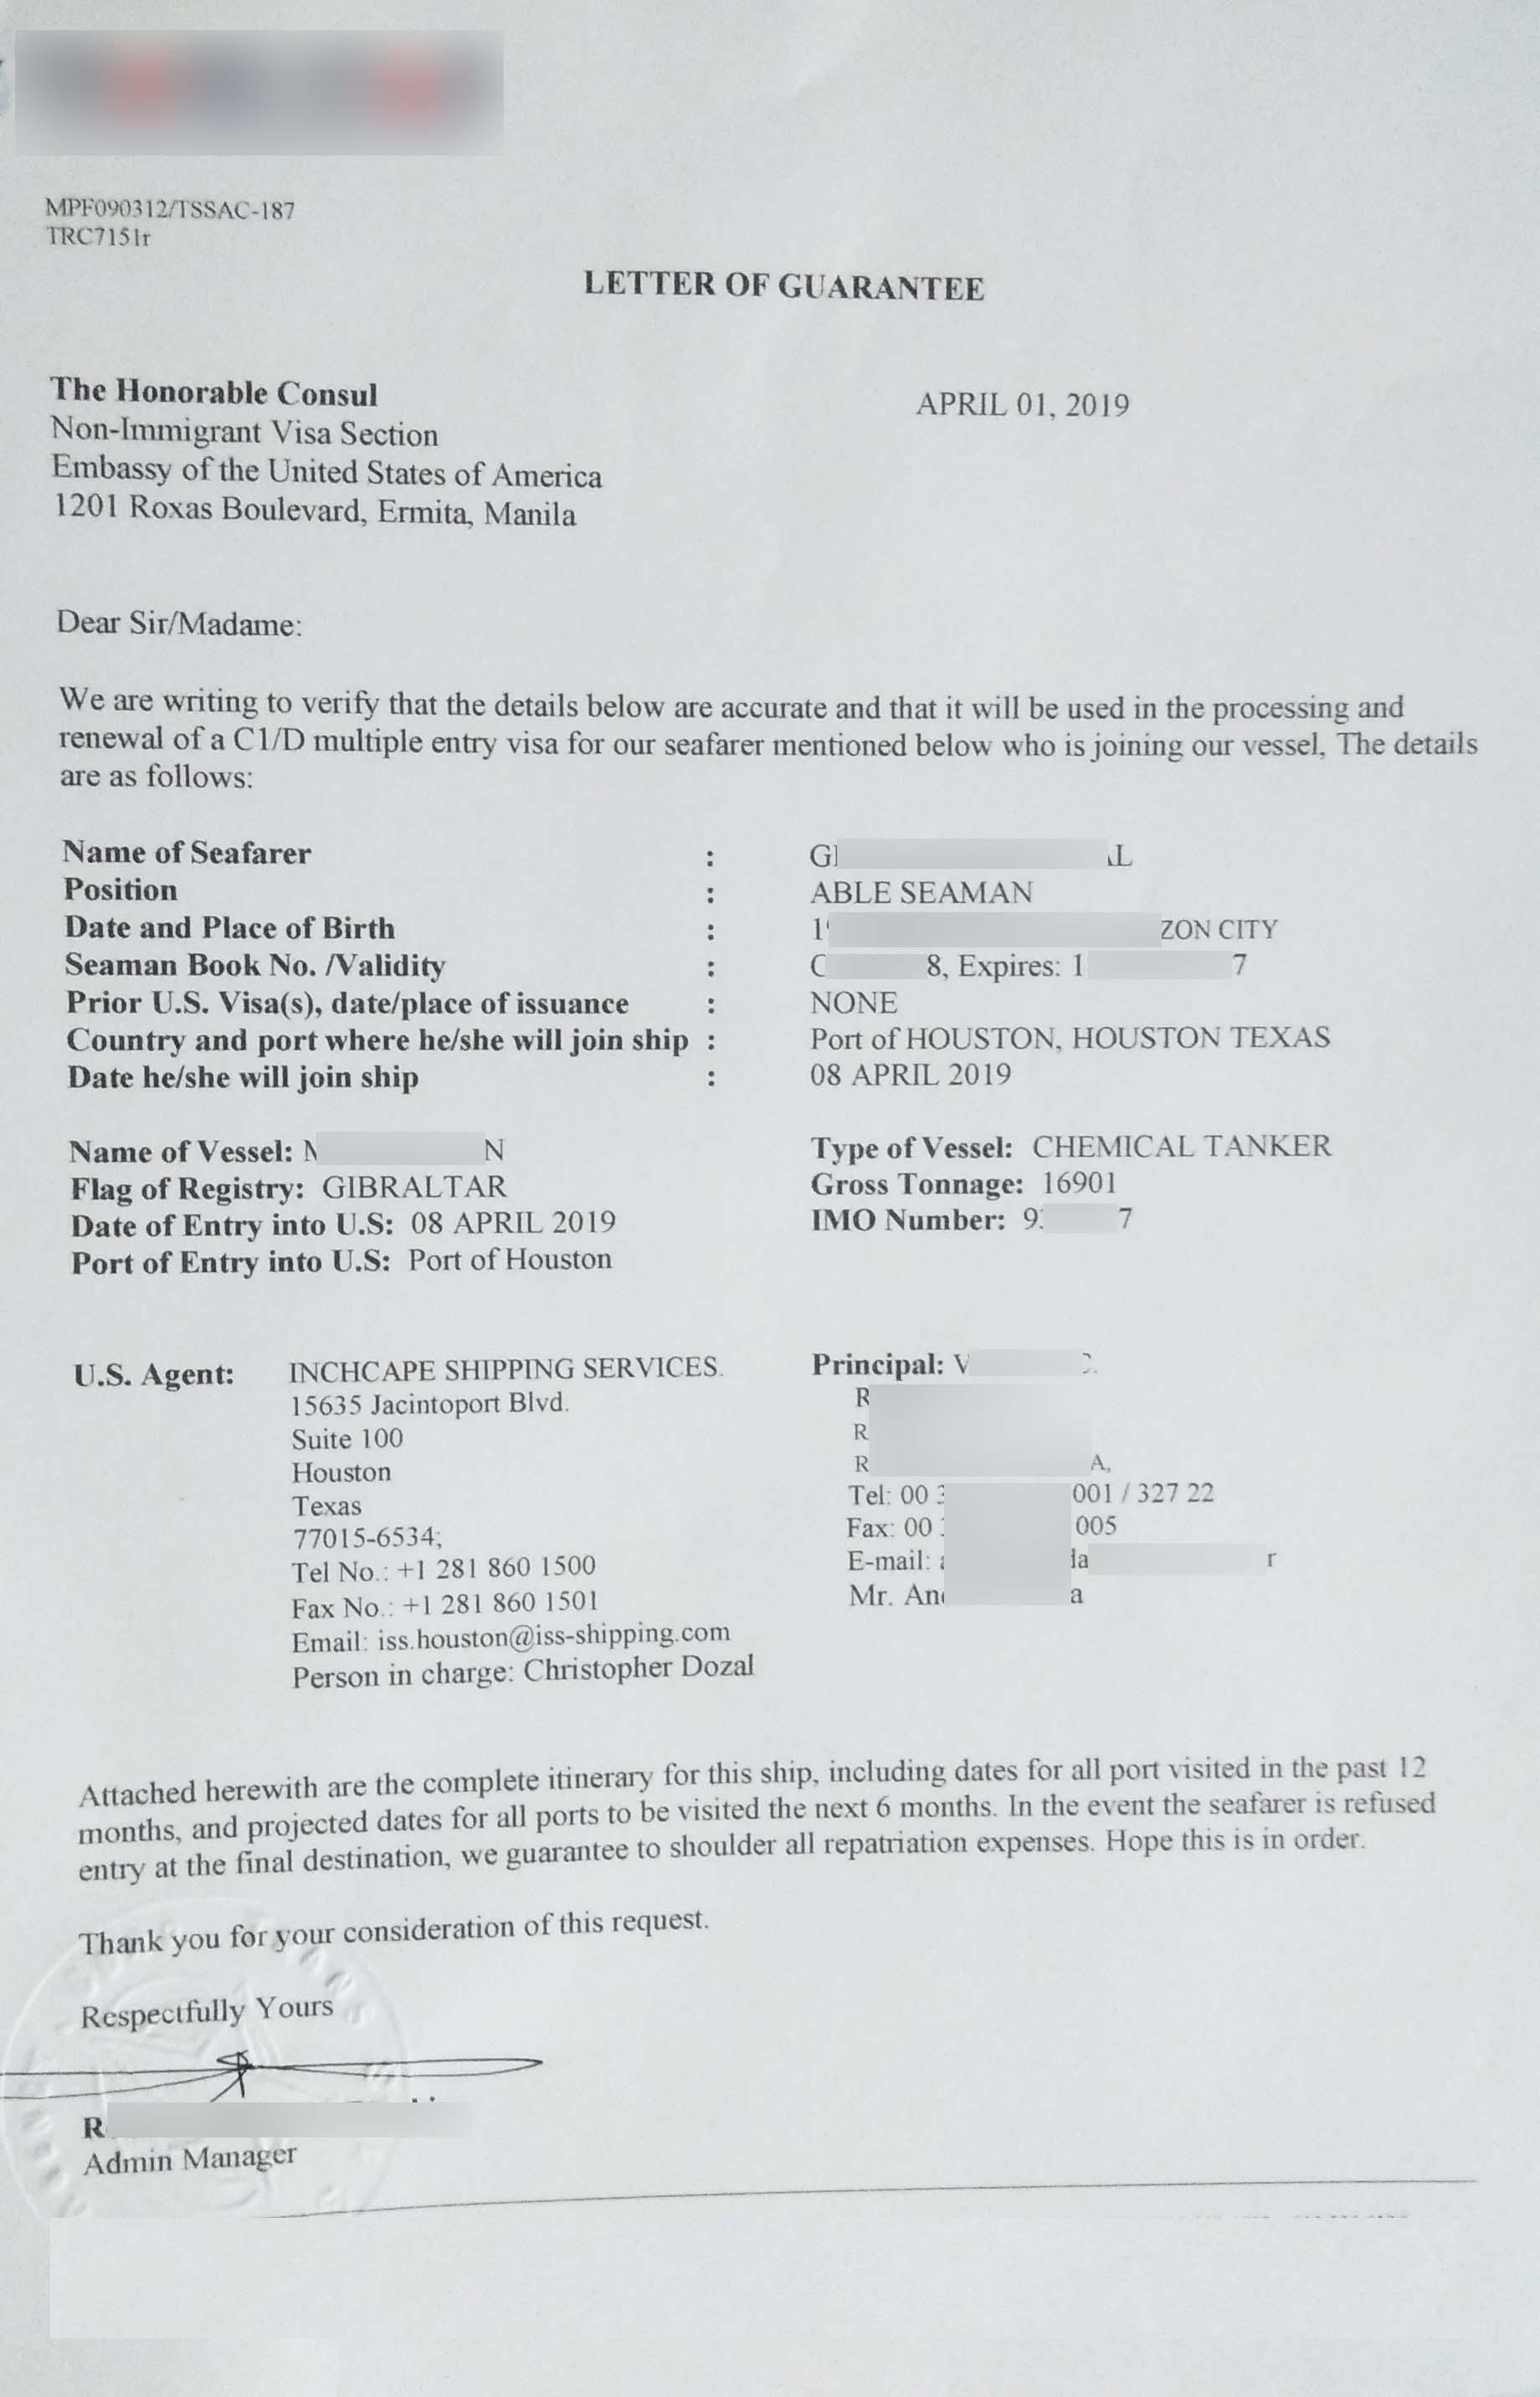 C1/D US Visa Application and Renewal Guide for Seamen